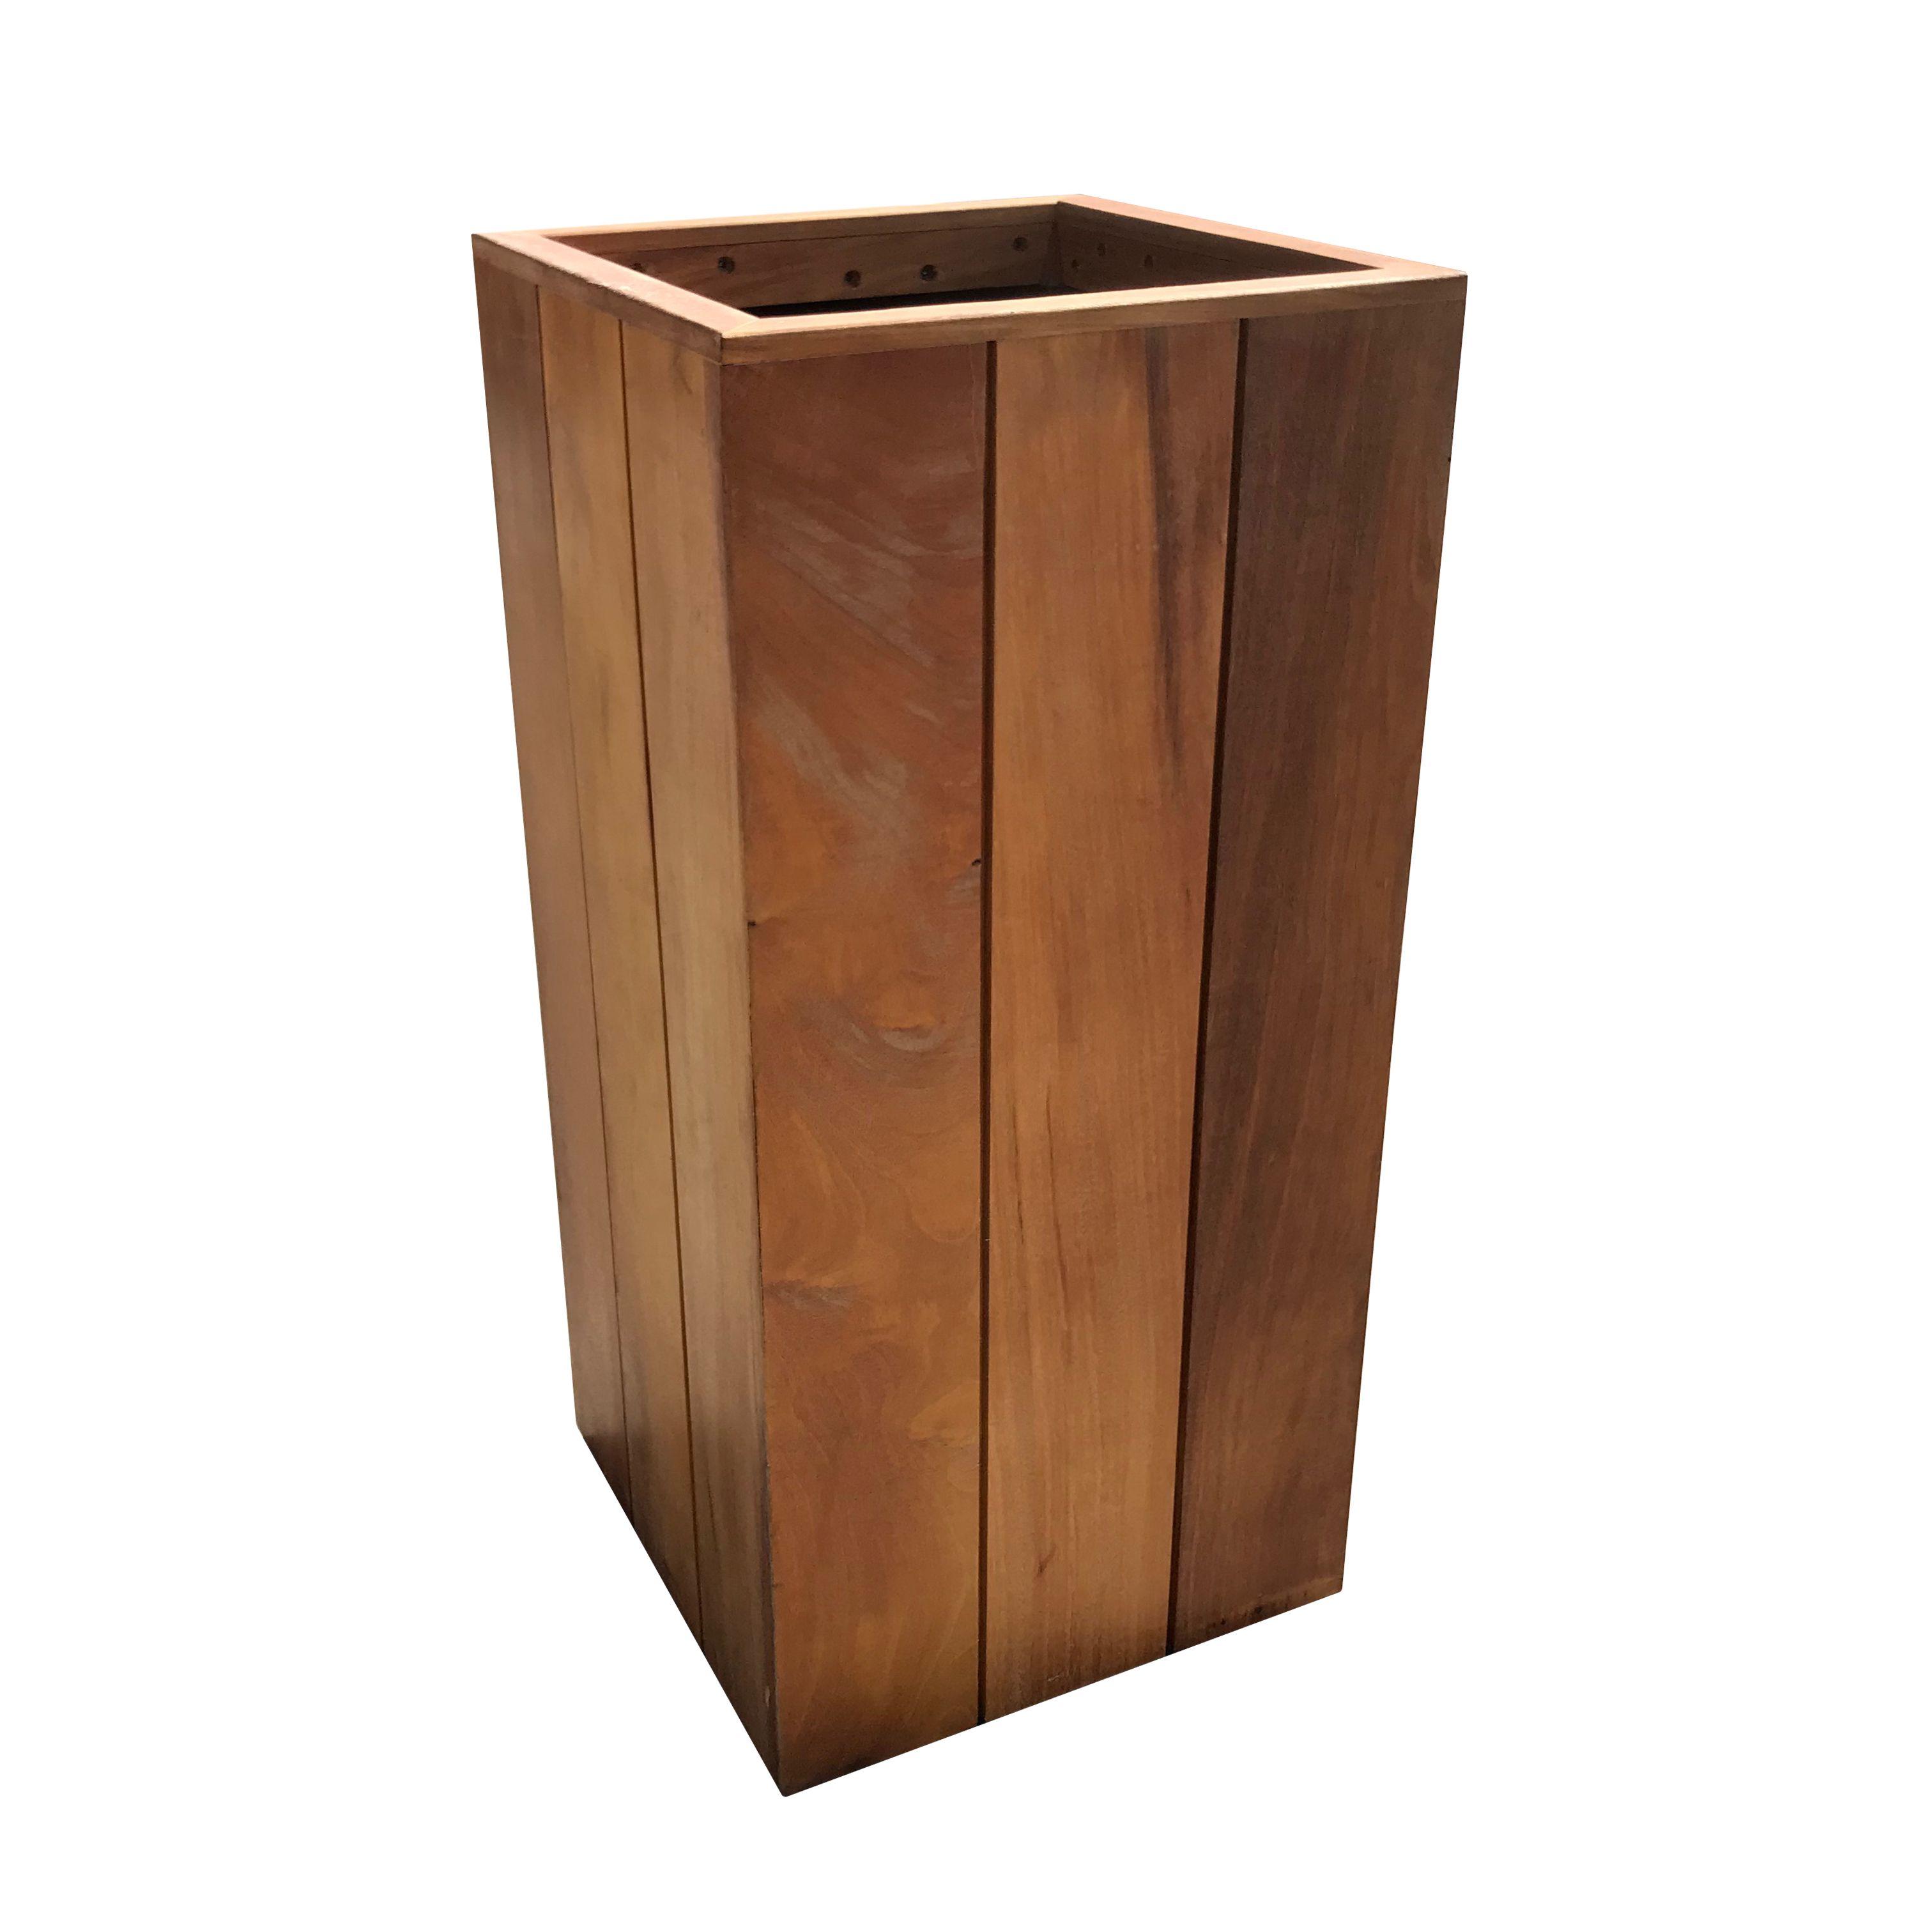 Hardhout Plantenbak Staande Pilaar 30 X 30 X 70 Cm Bankirai